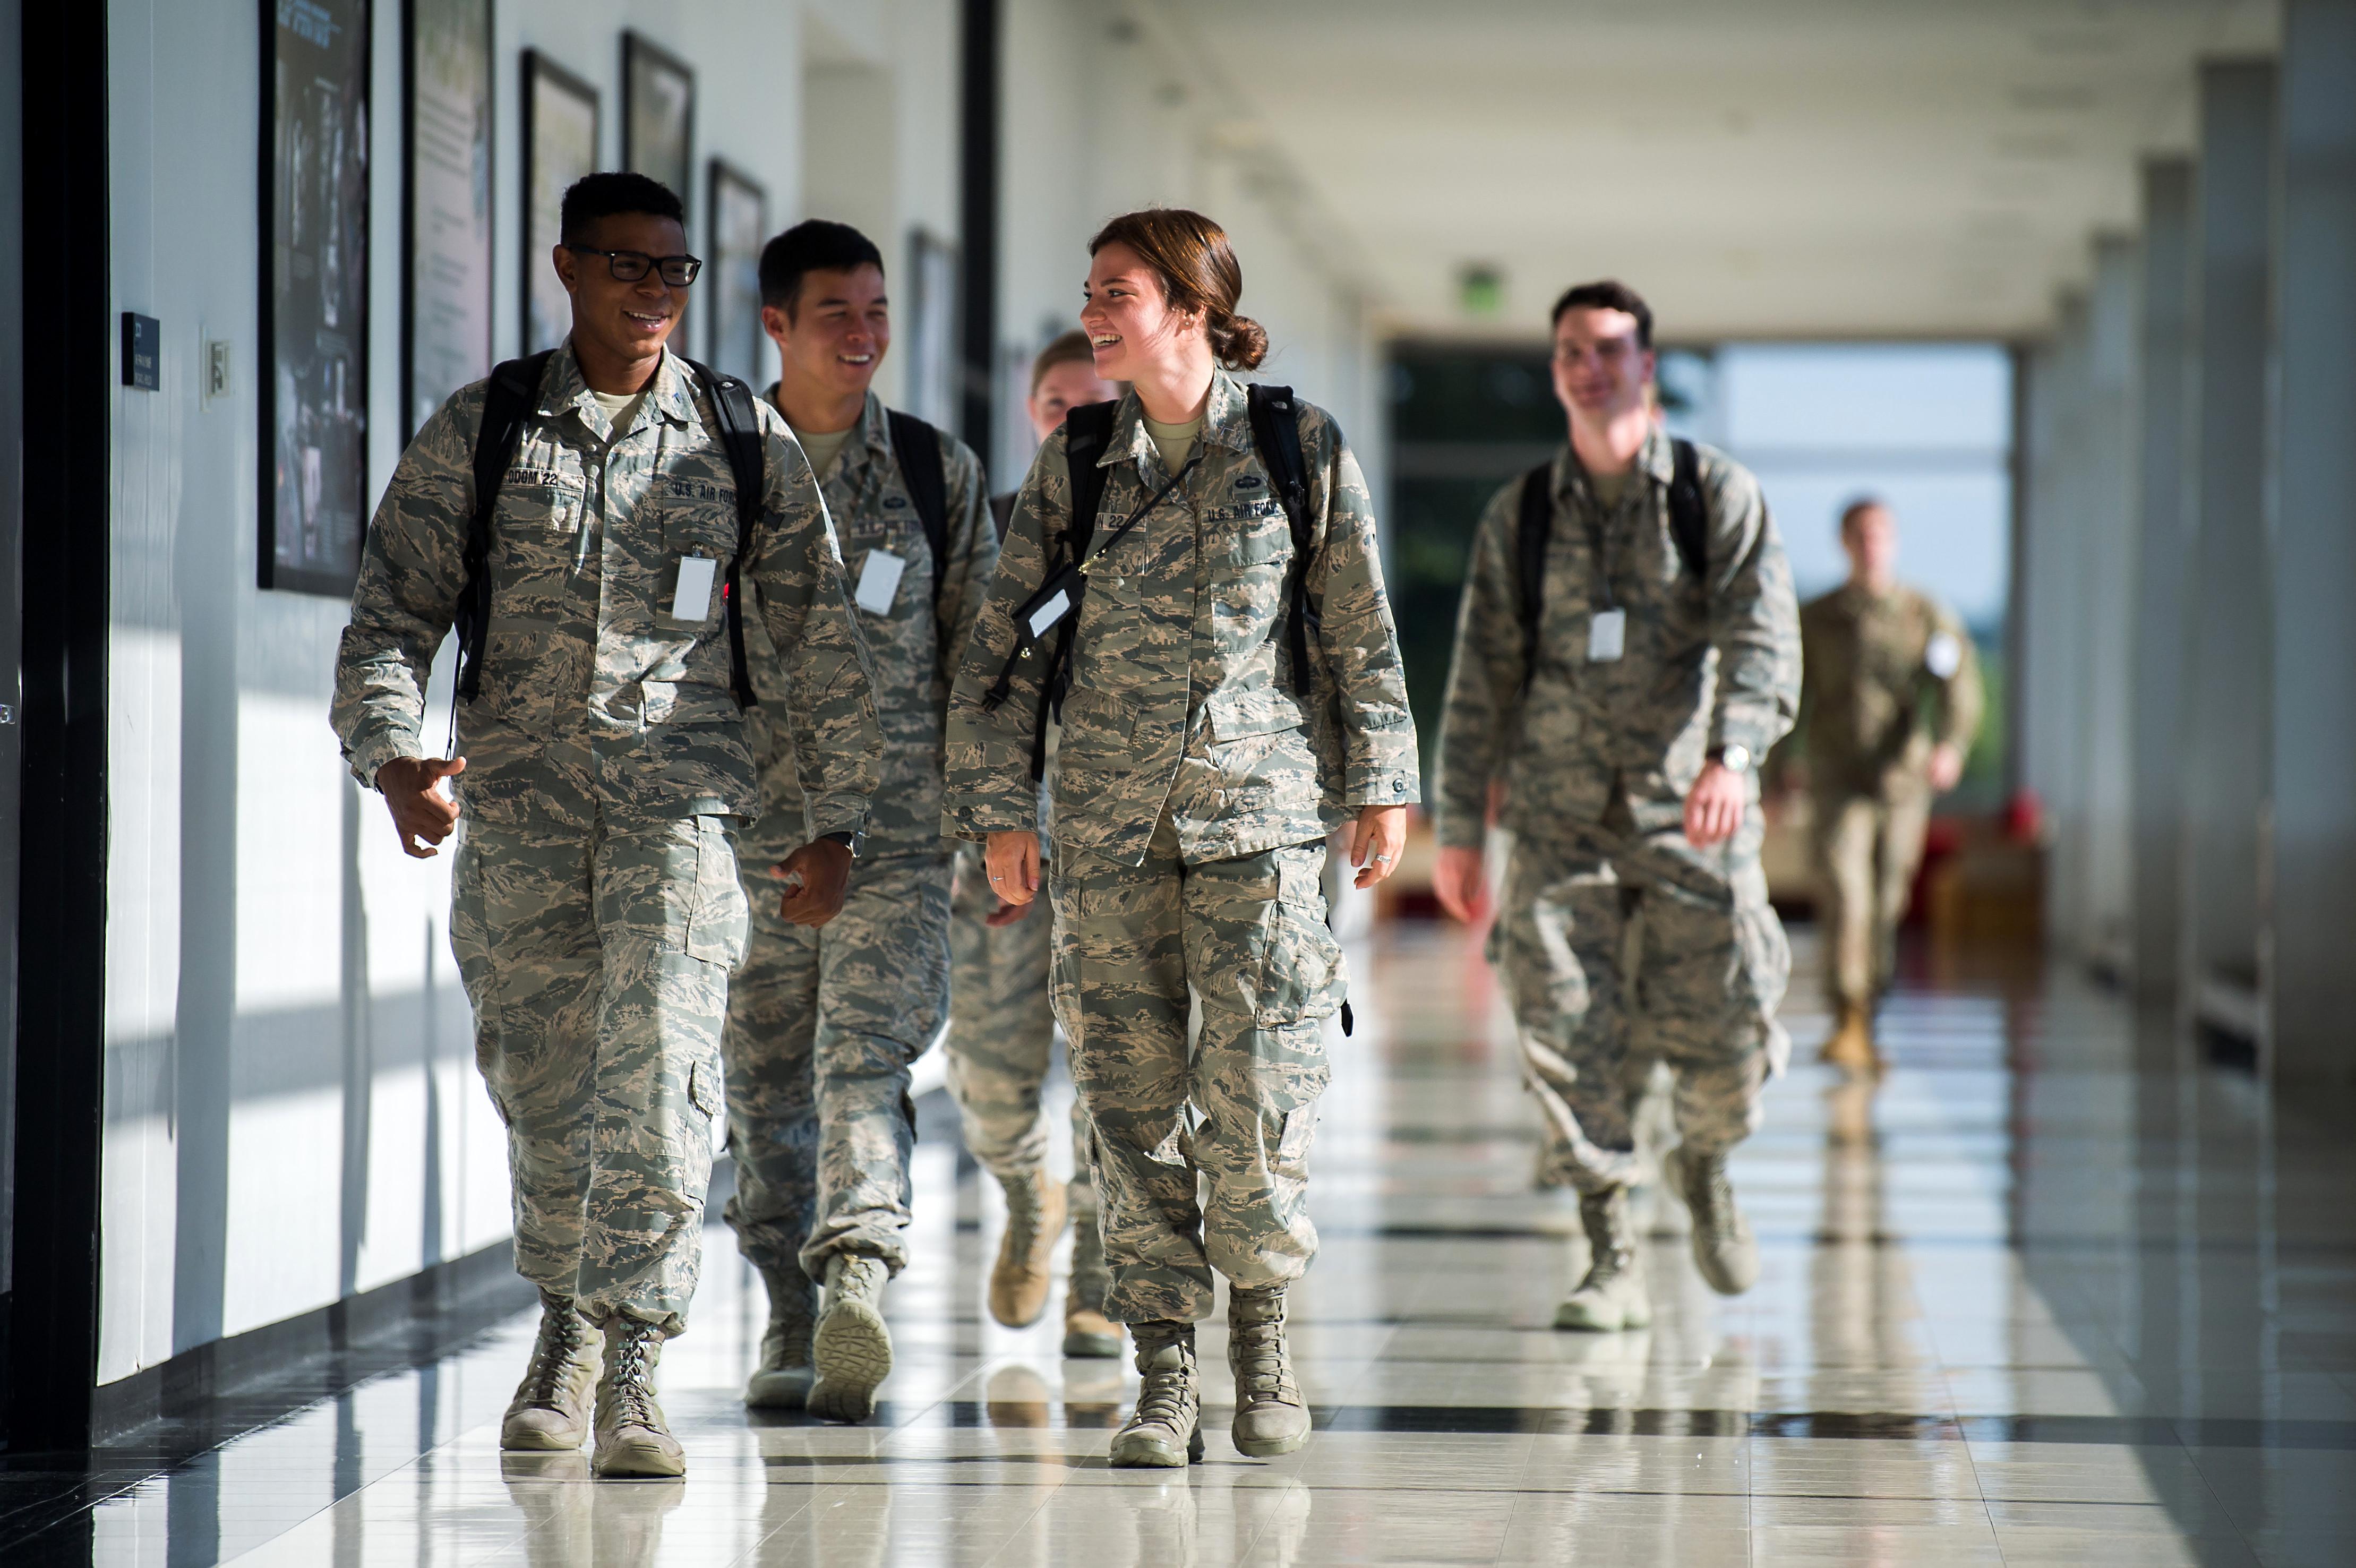 Air Force Academy awarded accreditation until 2028-2029 > U S  Air